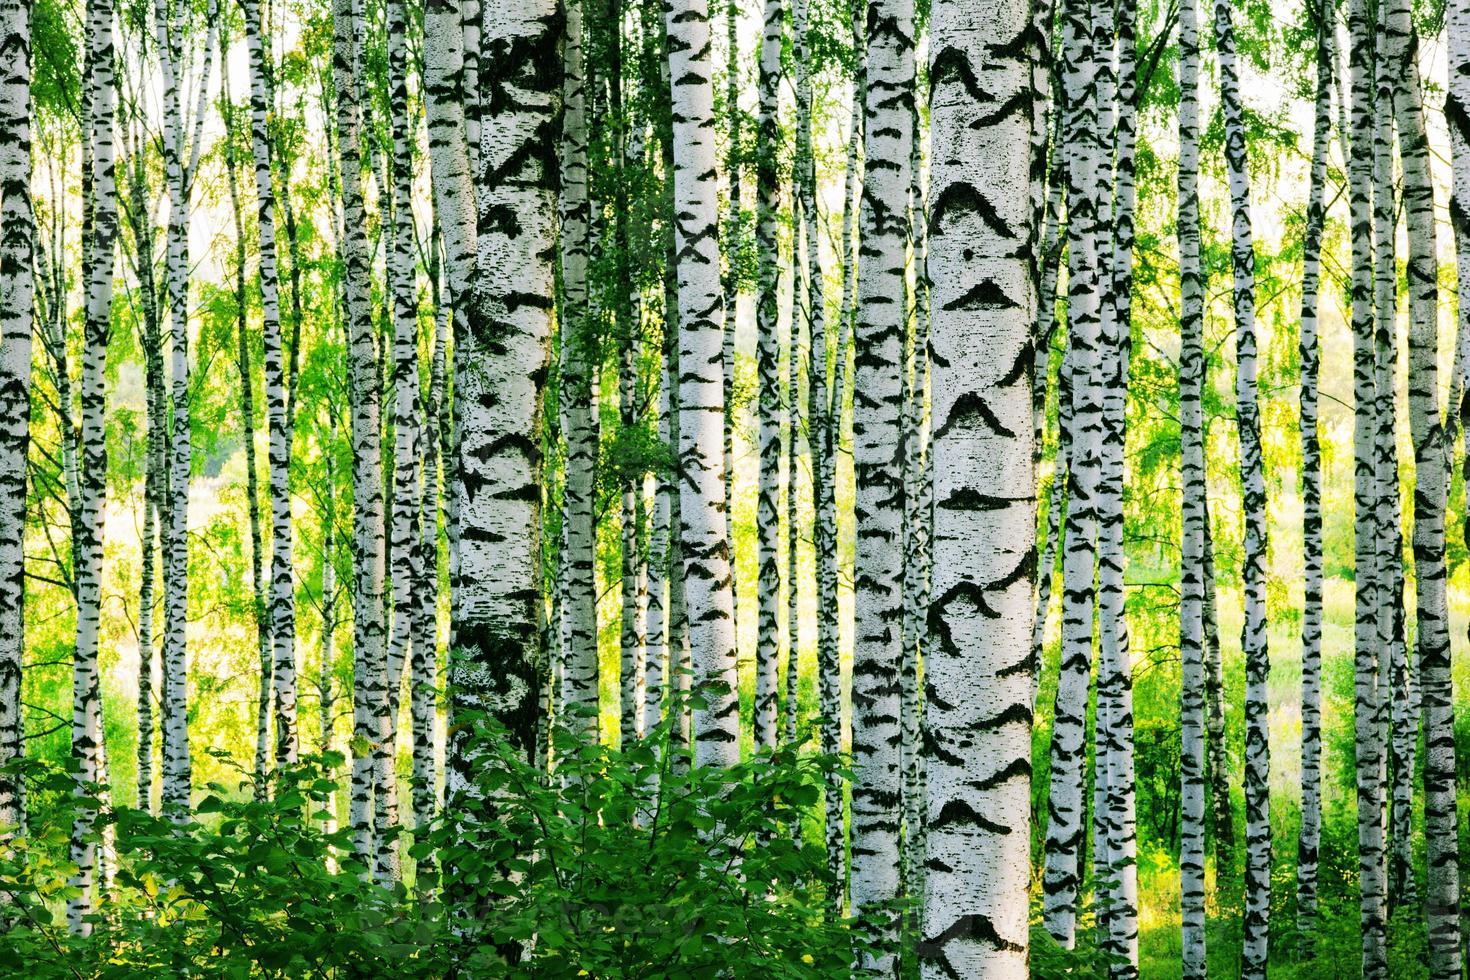 bouleau forestier photo